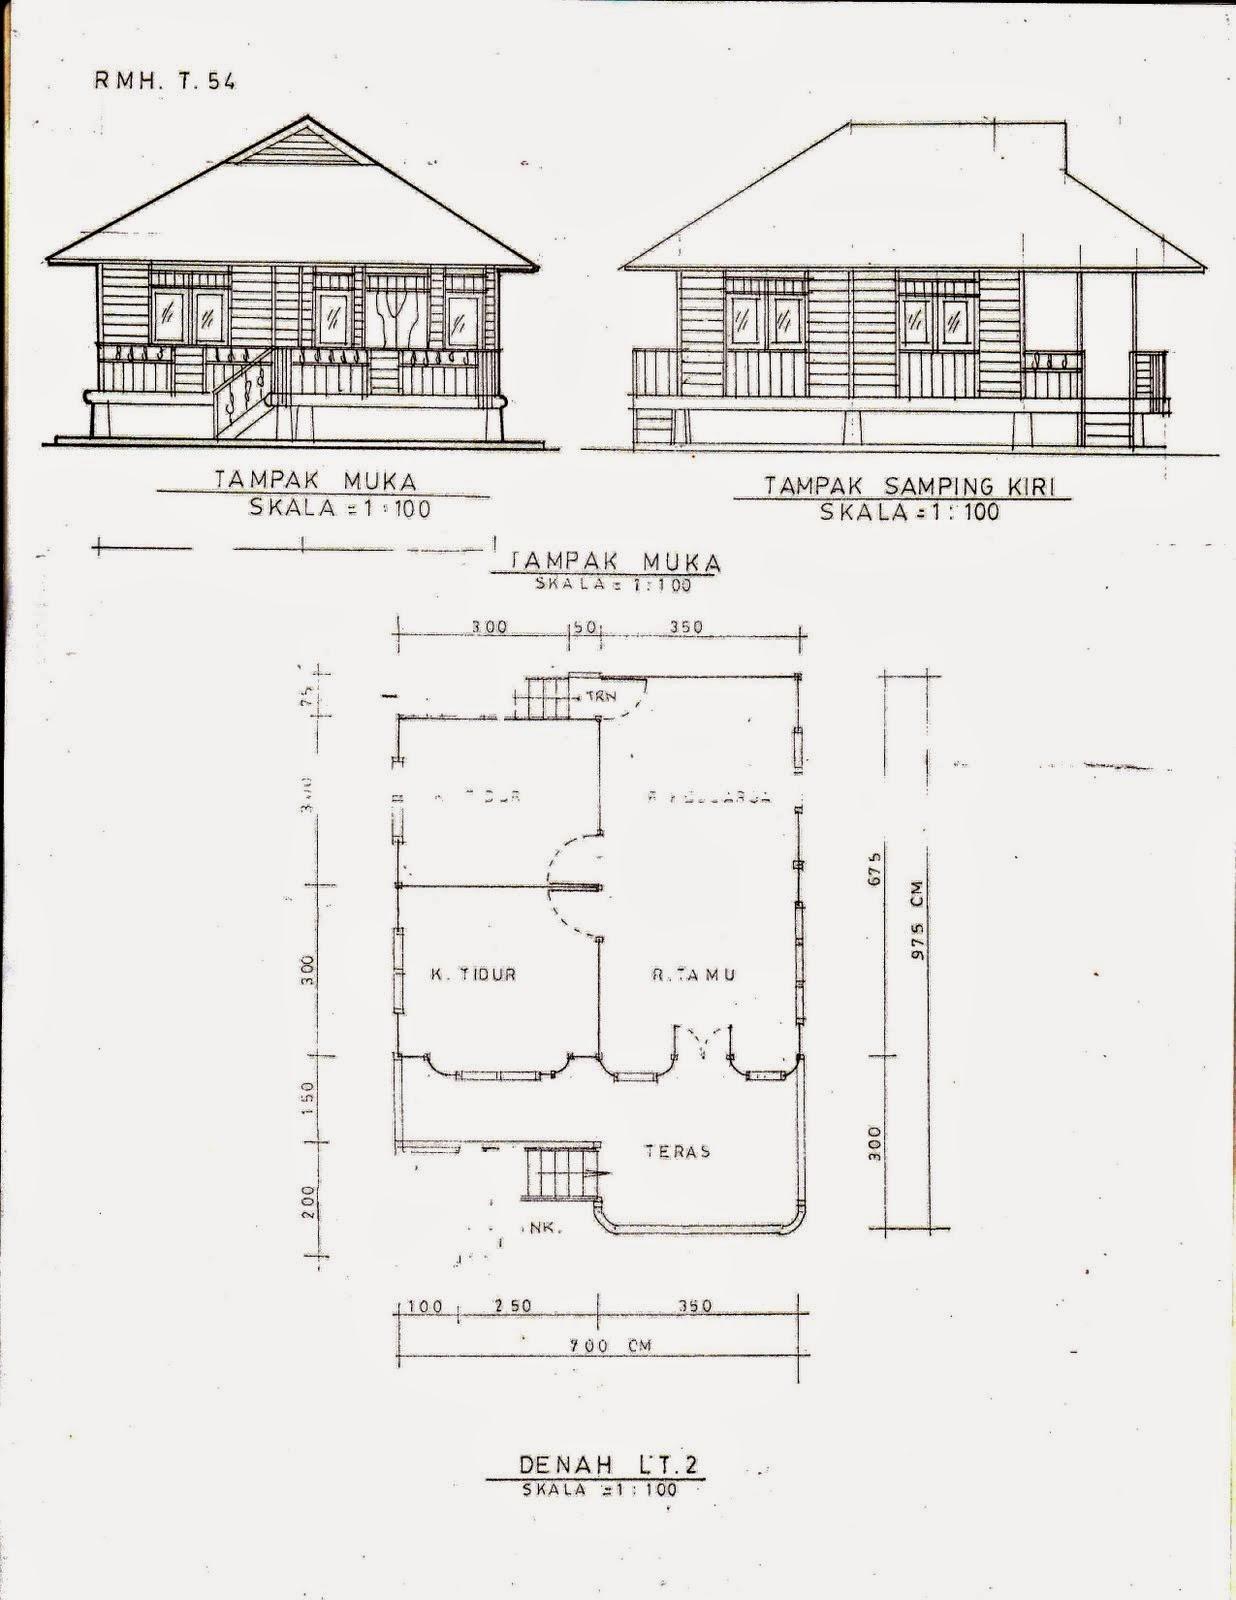 Contoh Desain Rumah Panggung Cek Bahan Bangunan